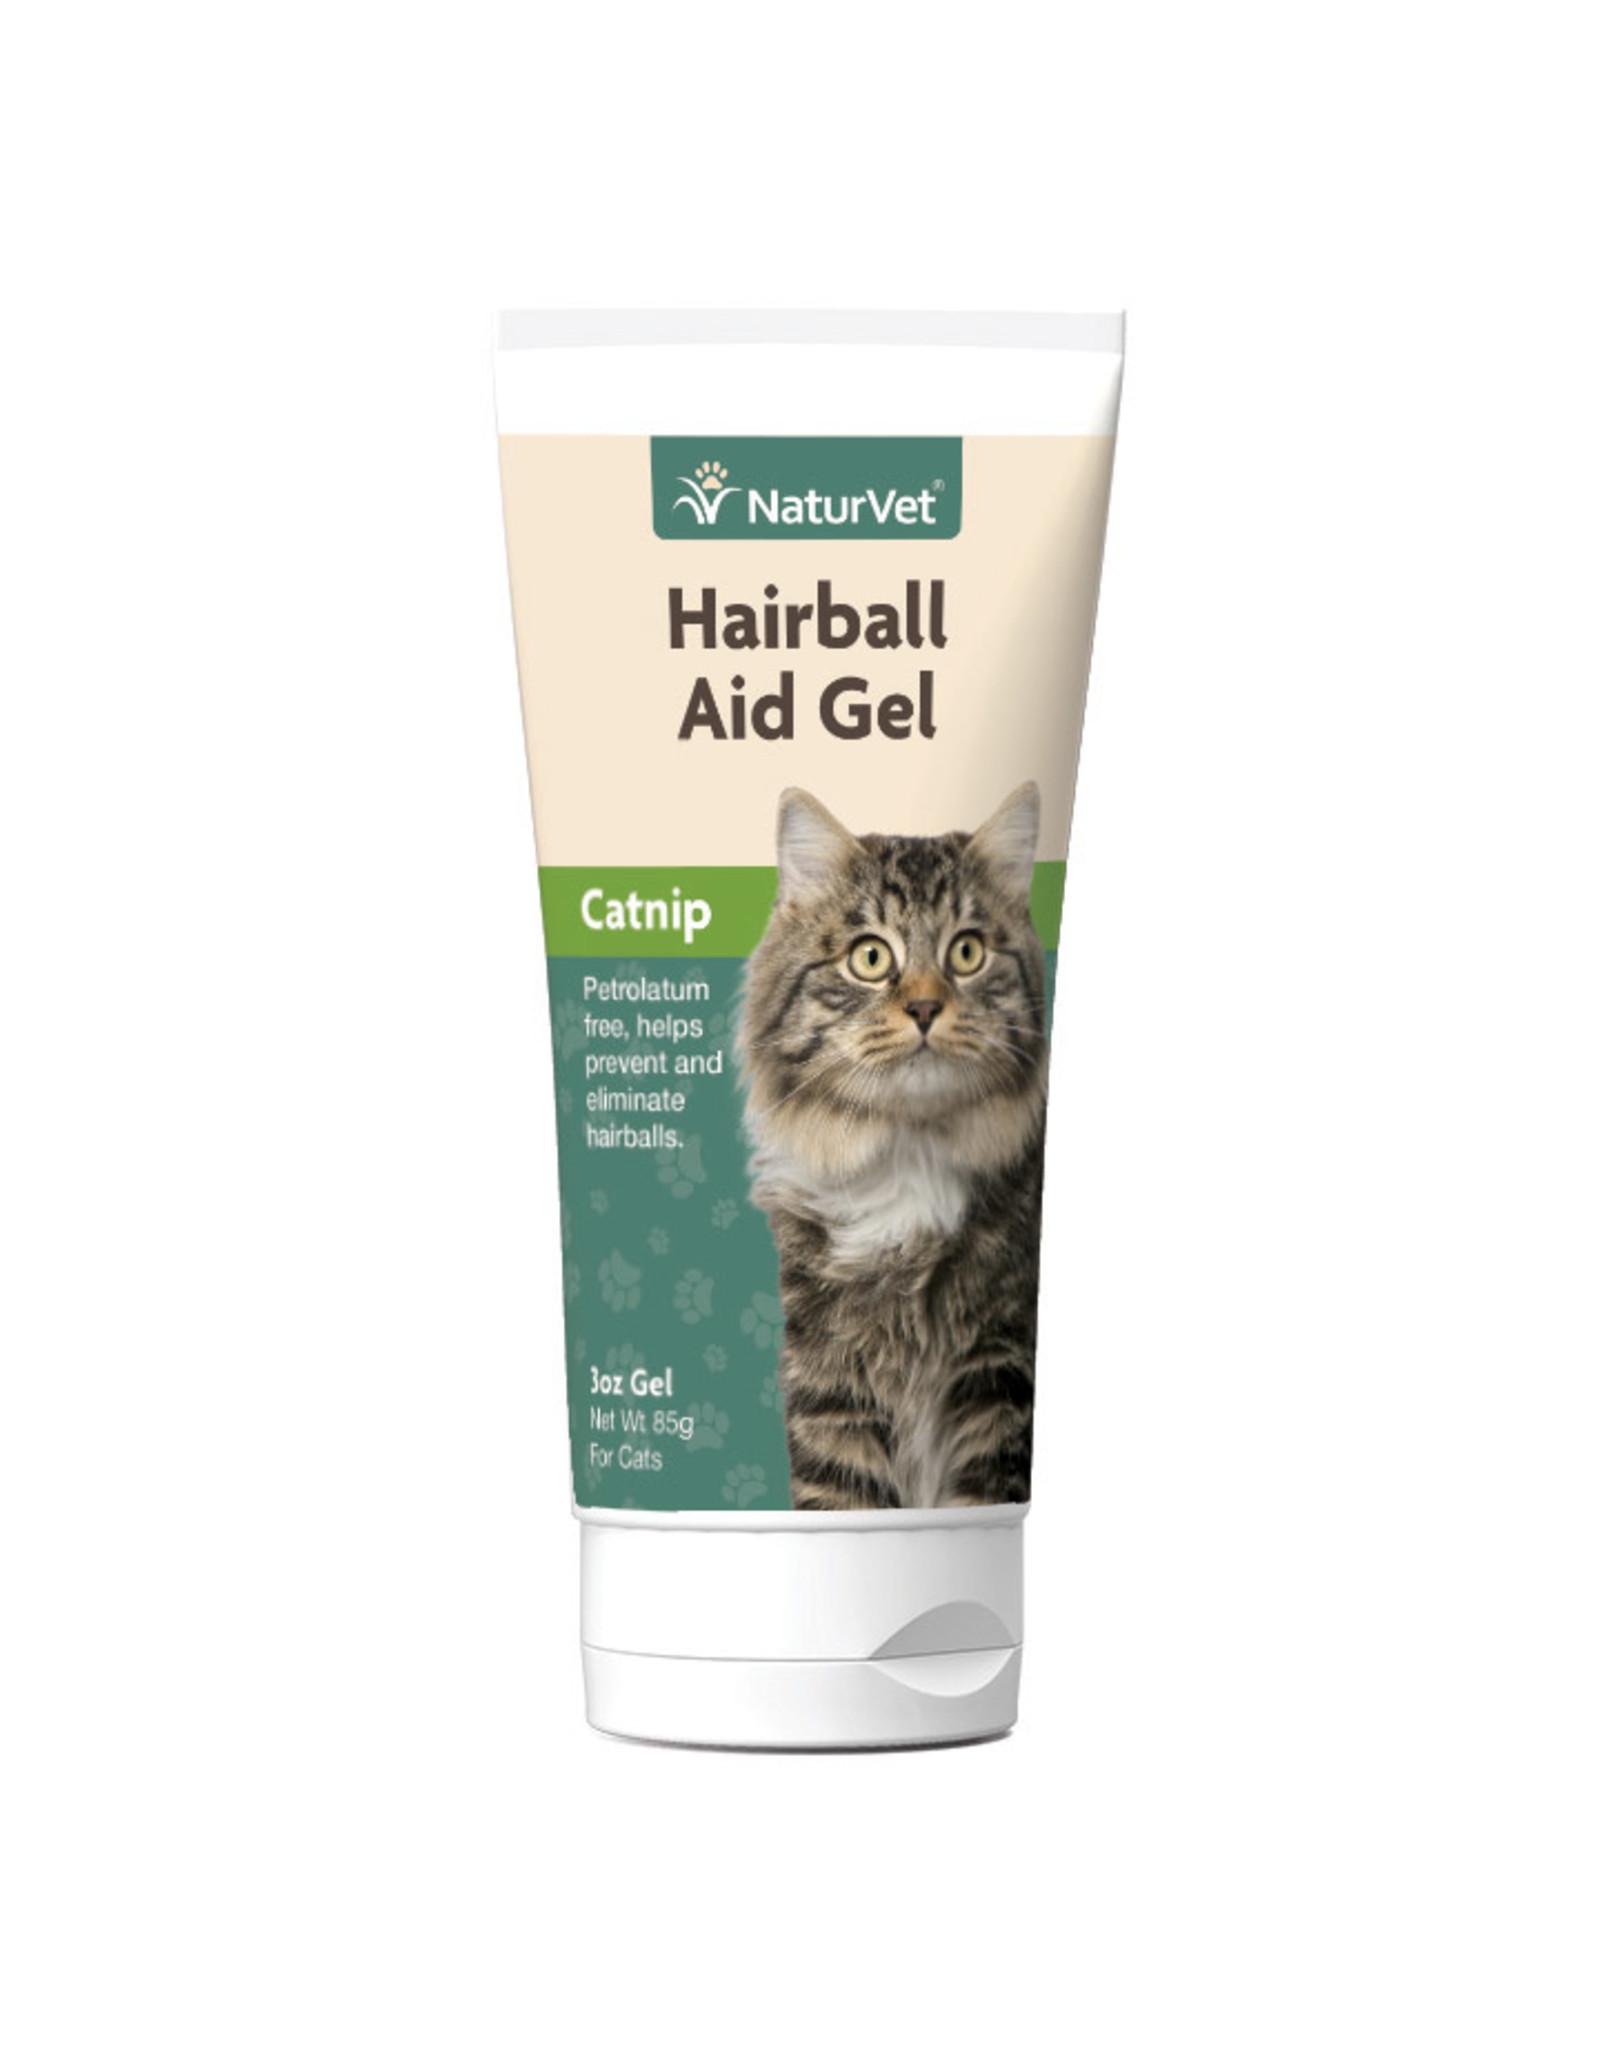 NaturVet NaturVet Cat Hairball Gel with Catnip 3oz